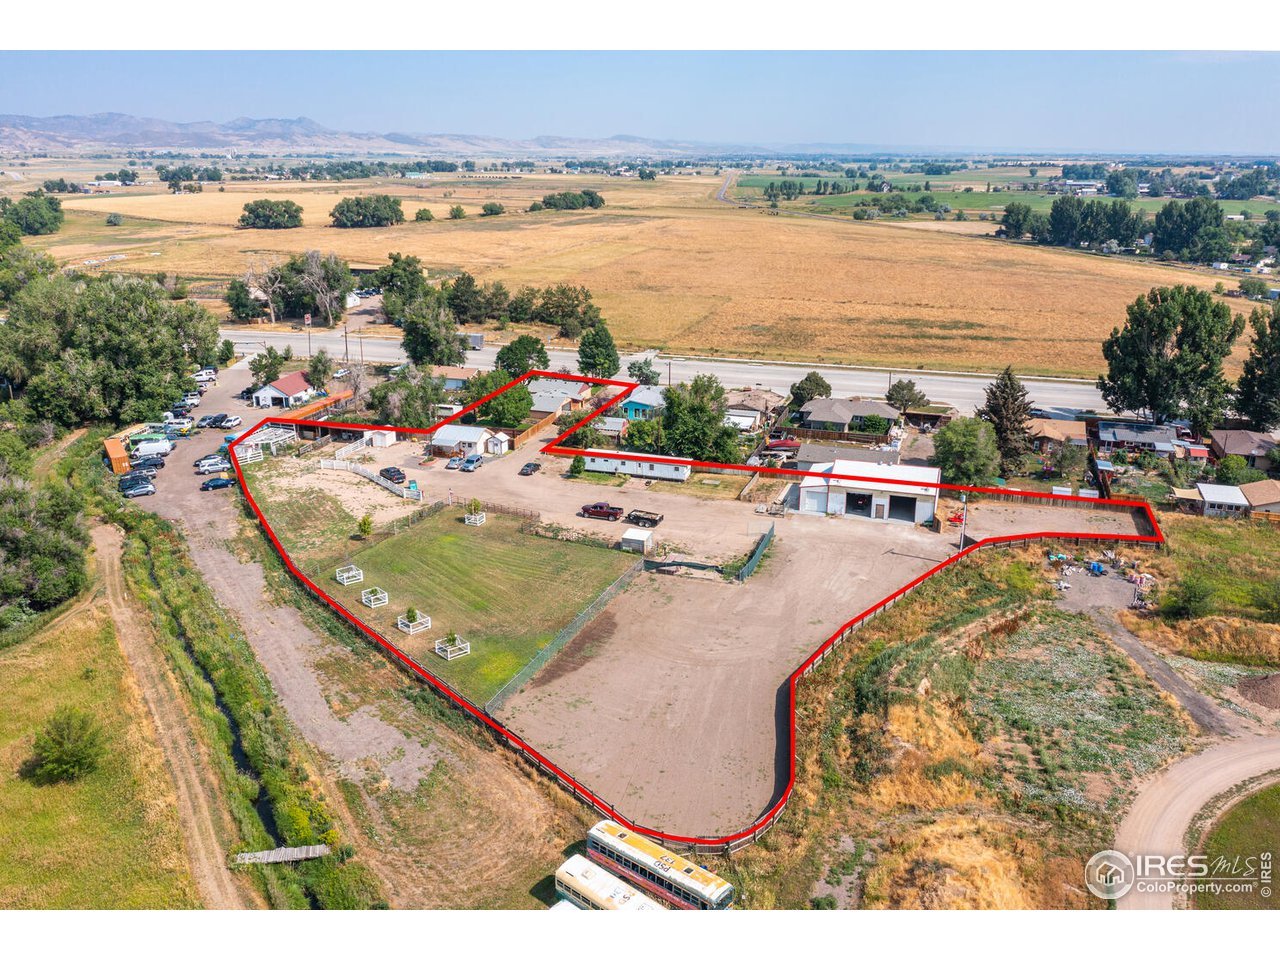 1309 N. US HWY 287, Fort Collins, CO 80524